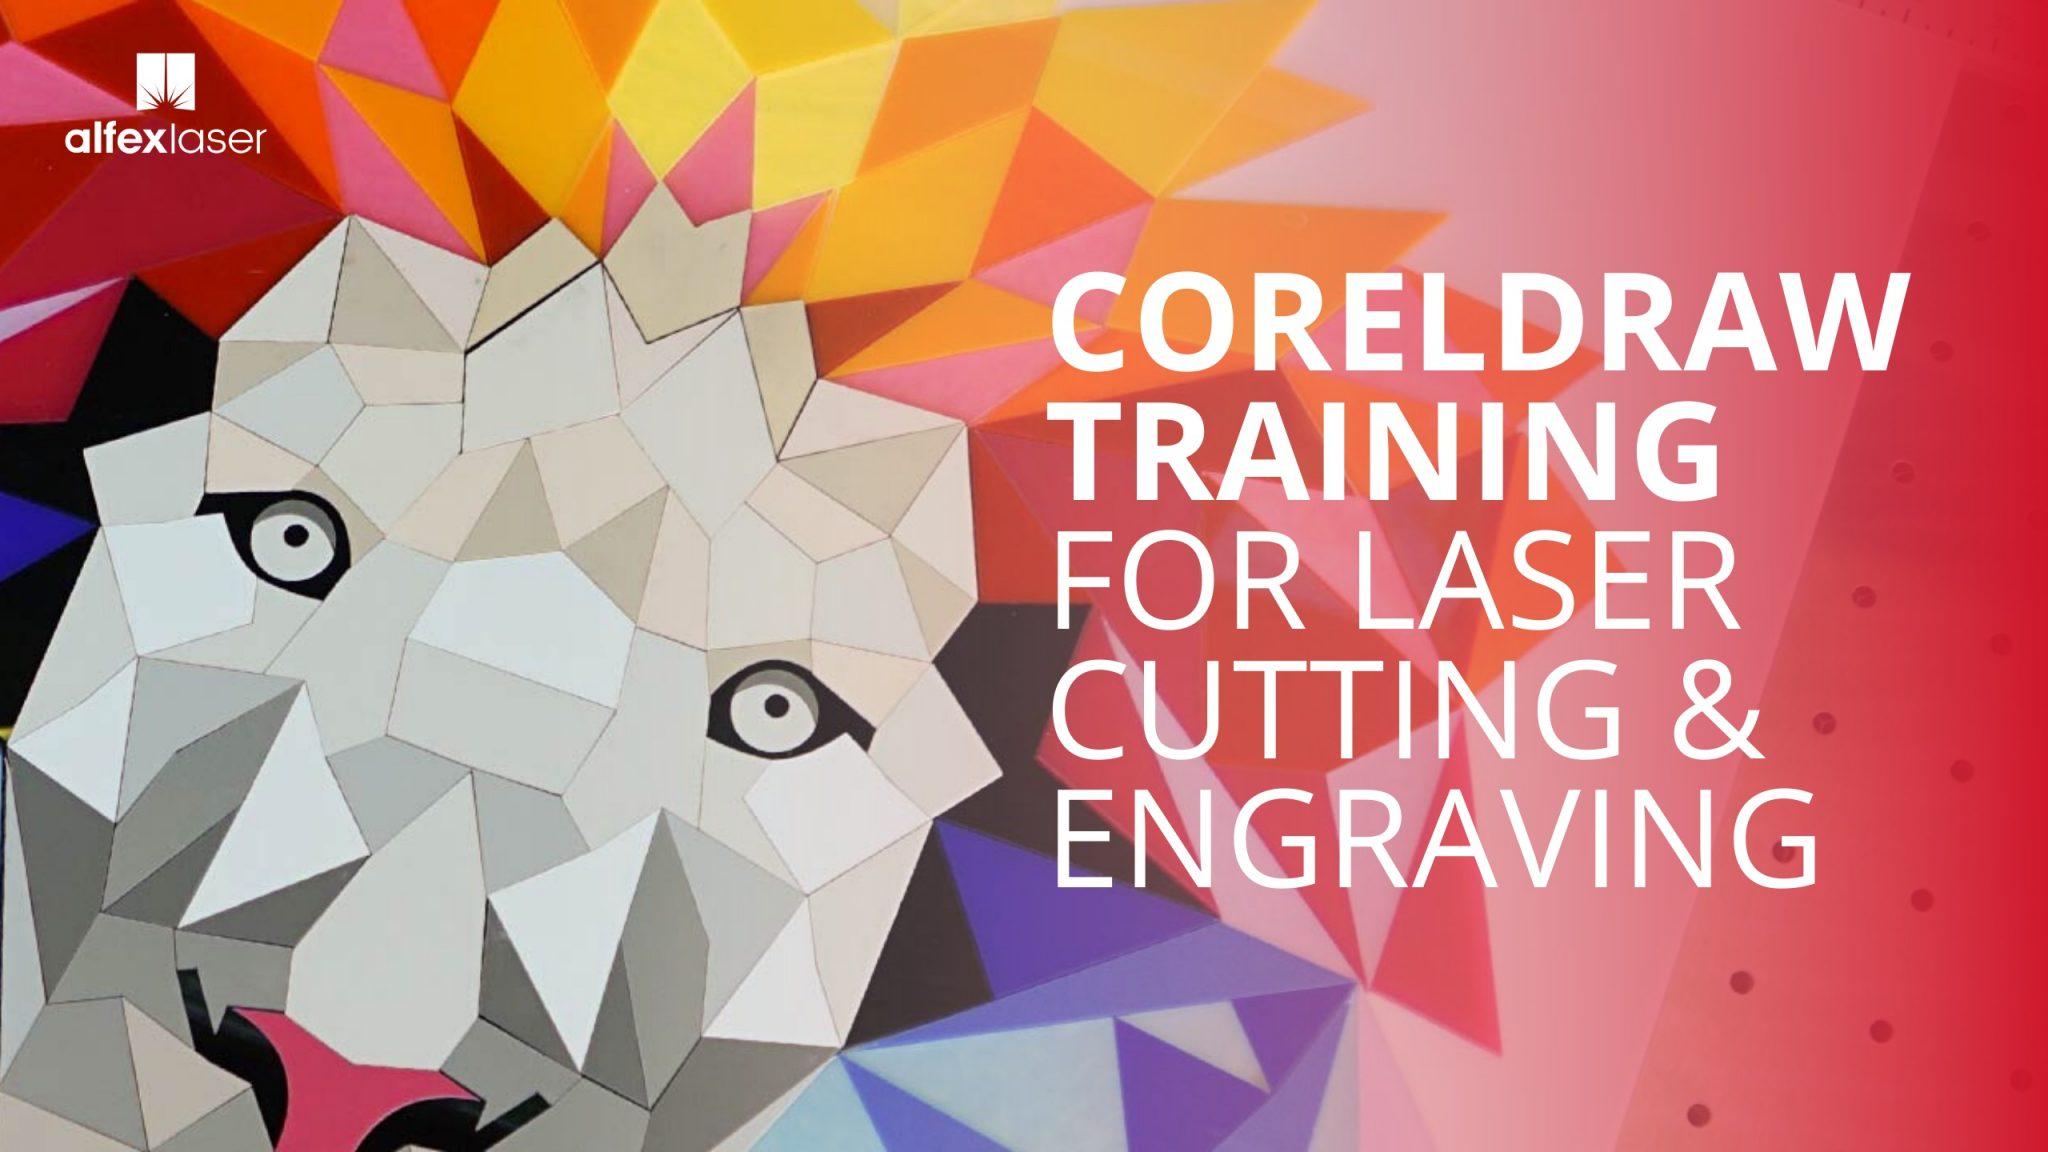 CorelDRAW Training Classes